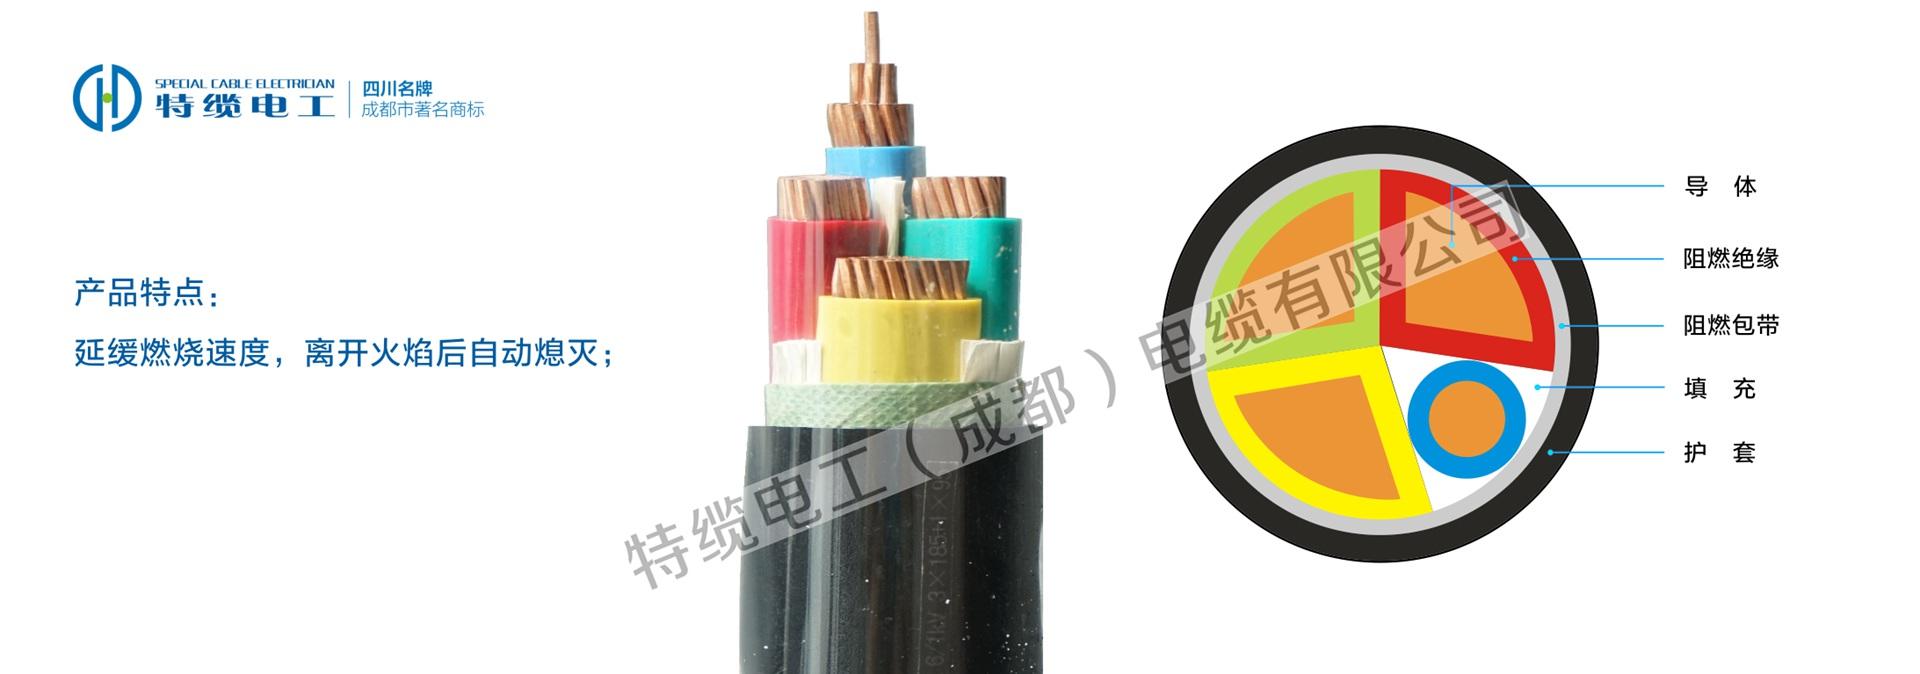 ZR-YJV22电力电缆